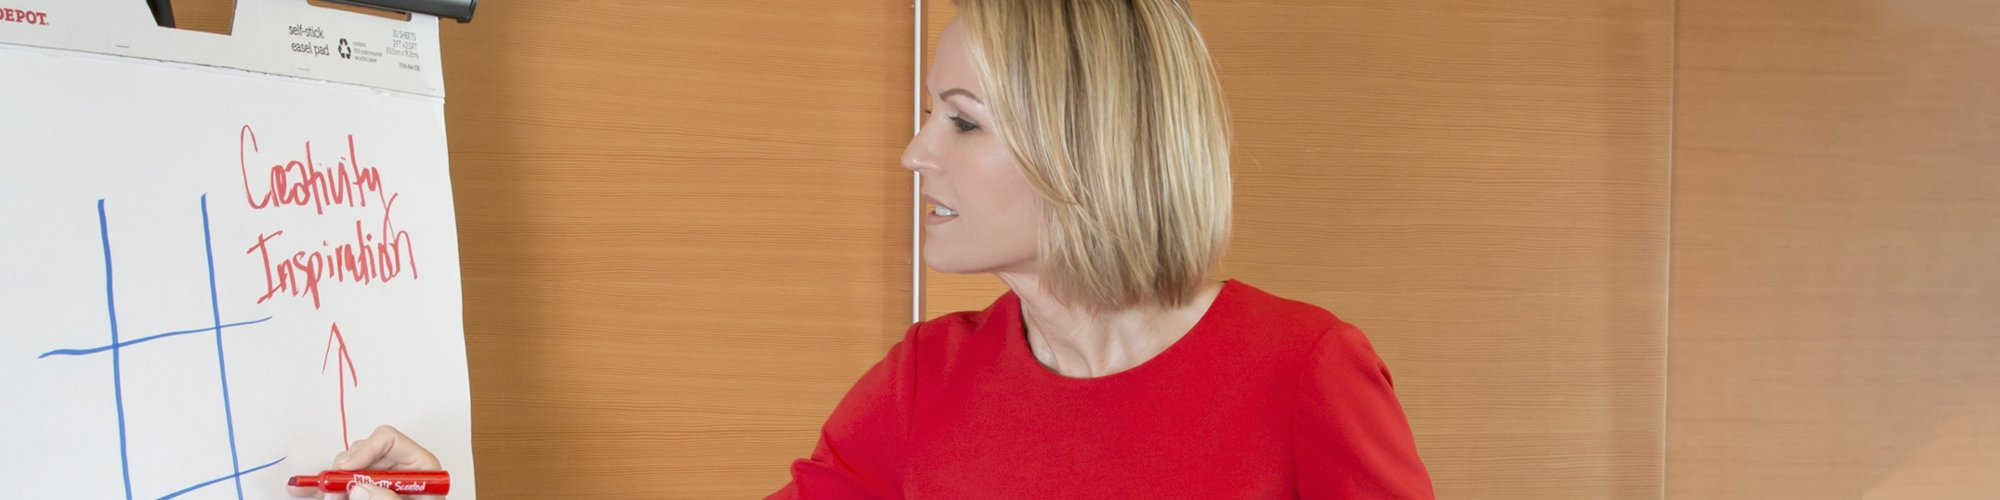 Pivot Business Profile on MB Social Magazine